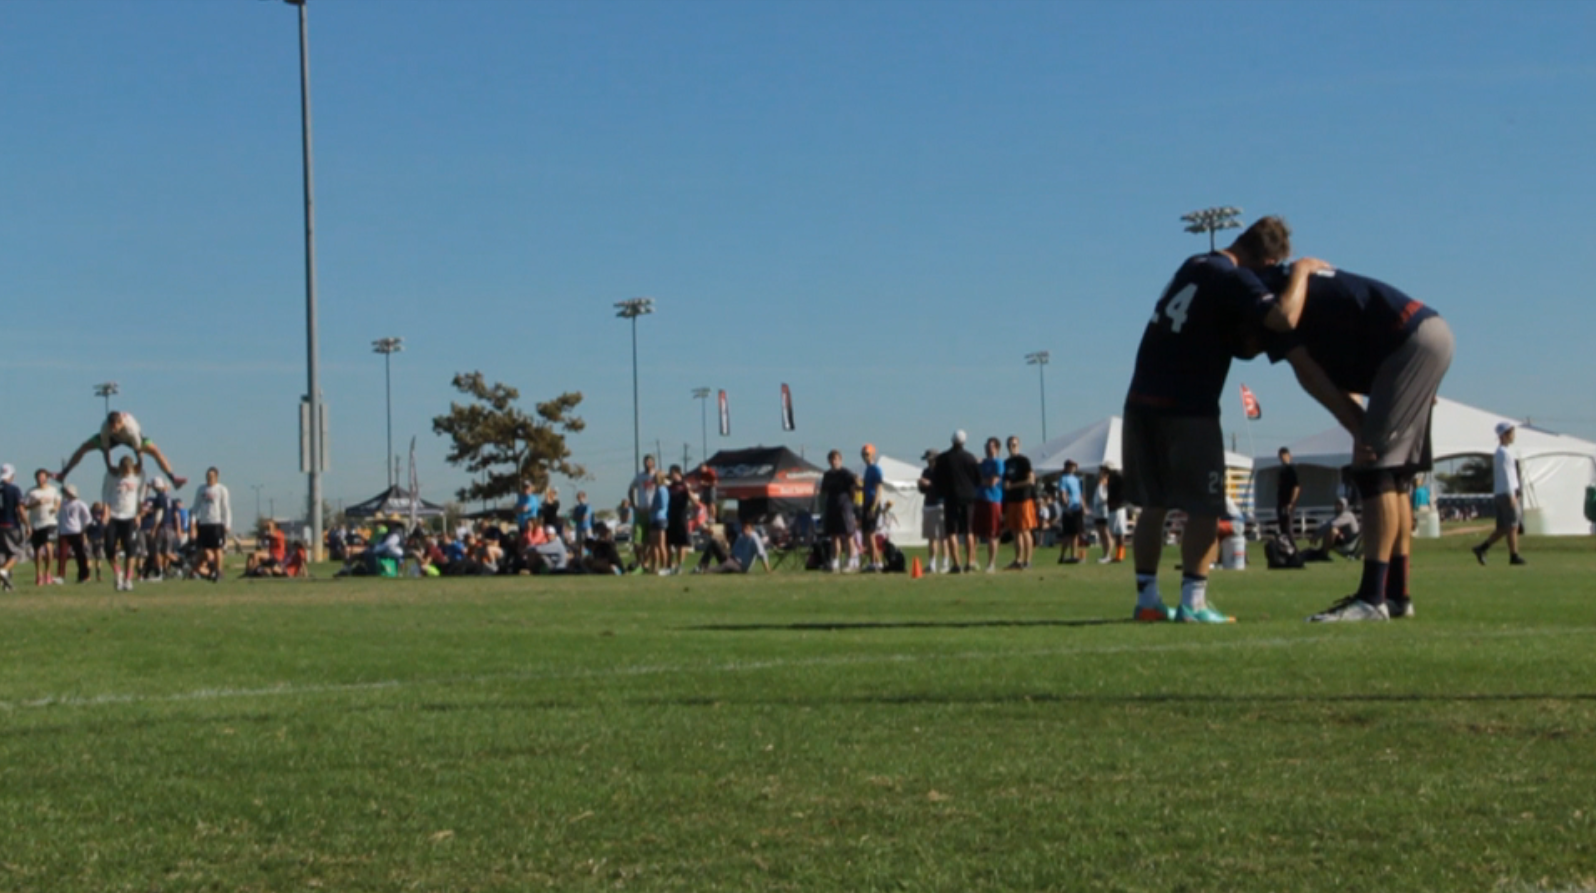 Doublewide v. Ironside at 2014 Nationals